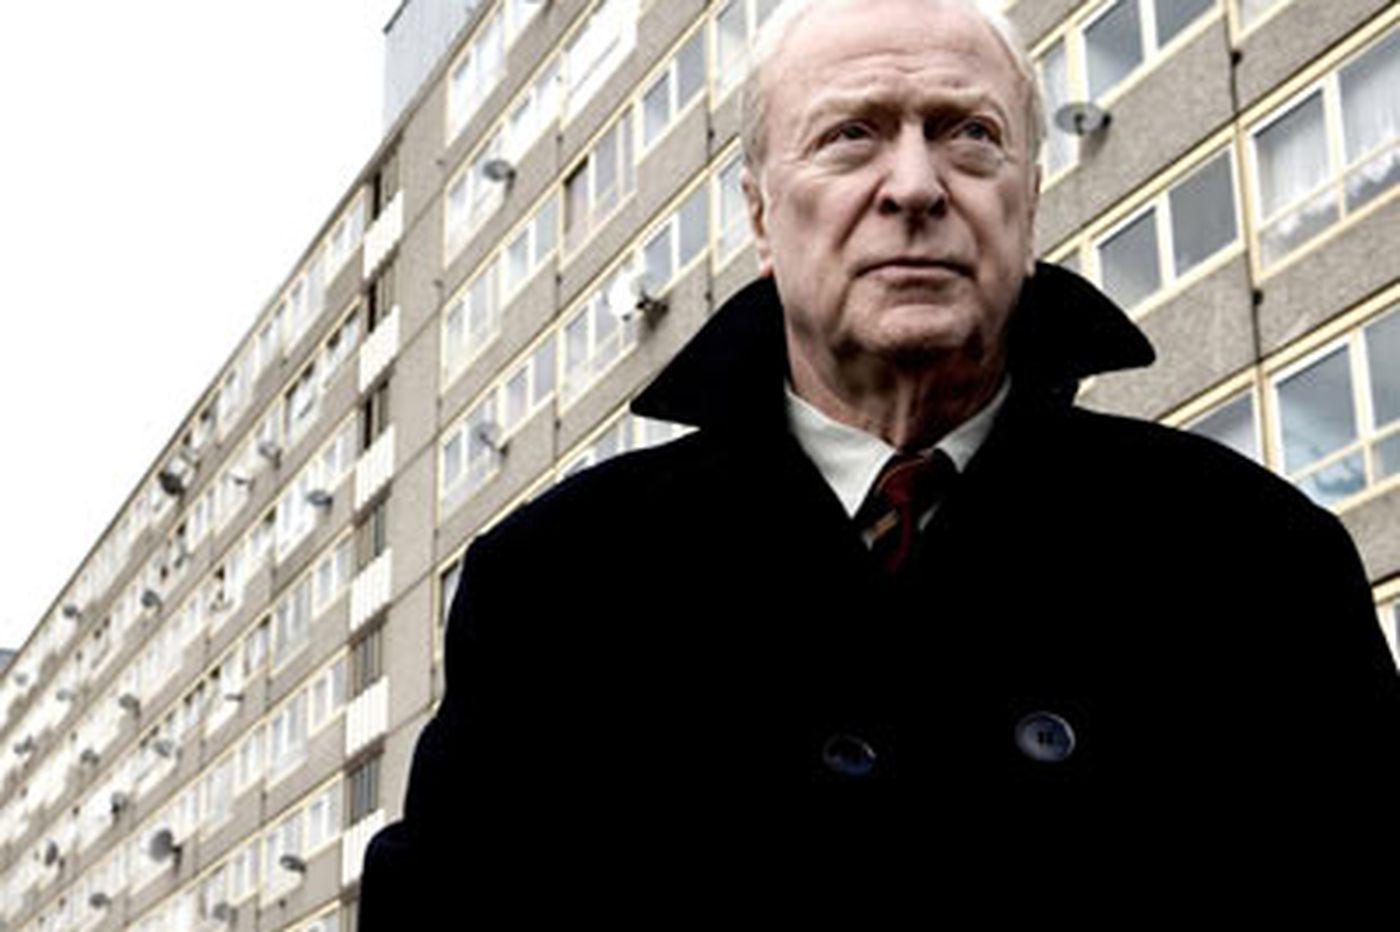 A London pensioner turns to vigilante violence